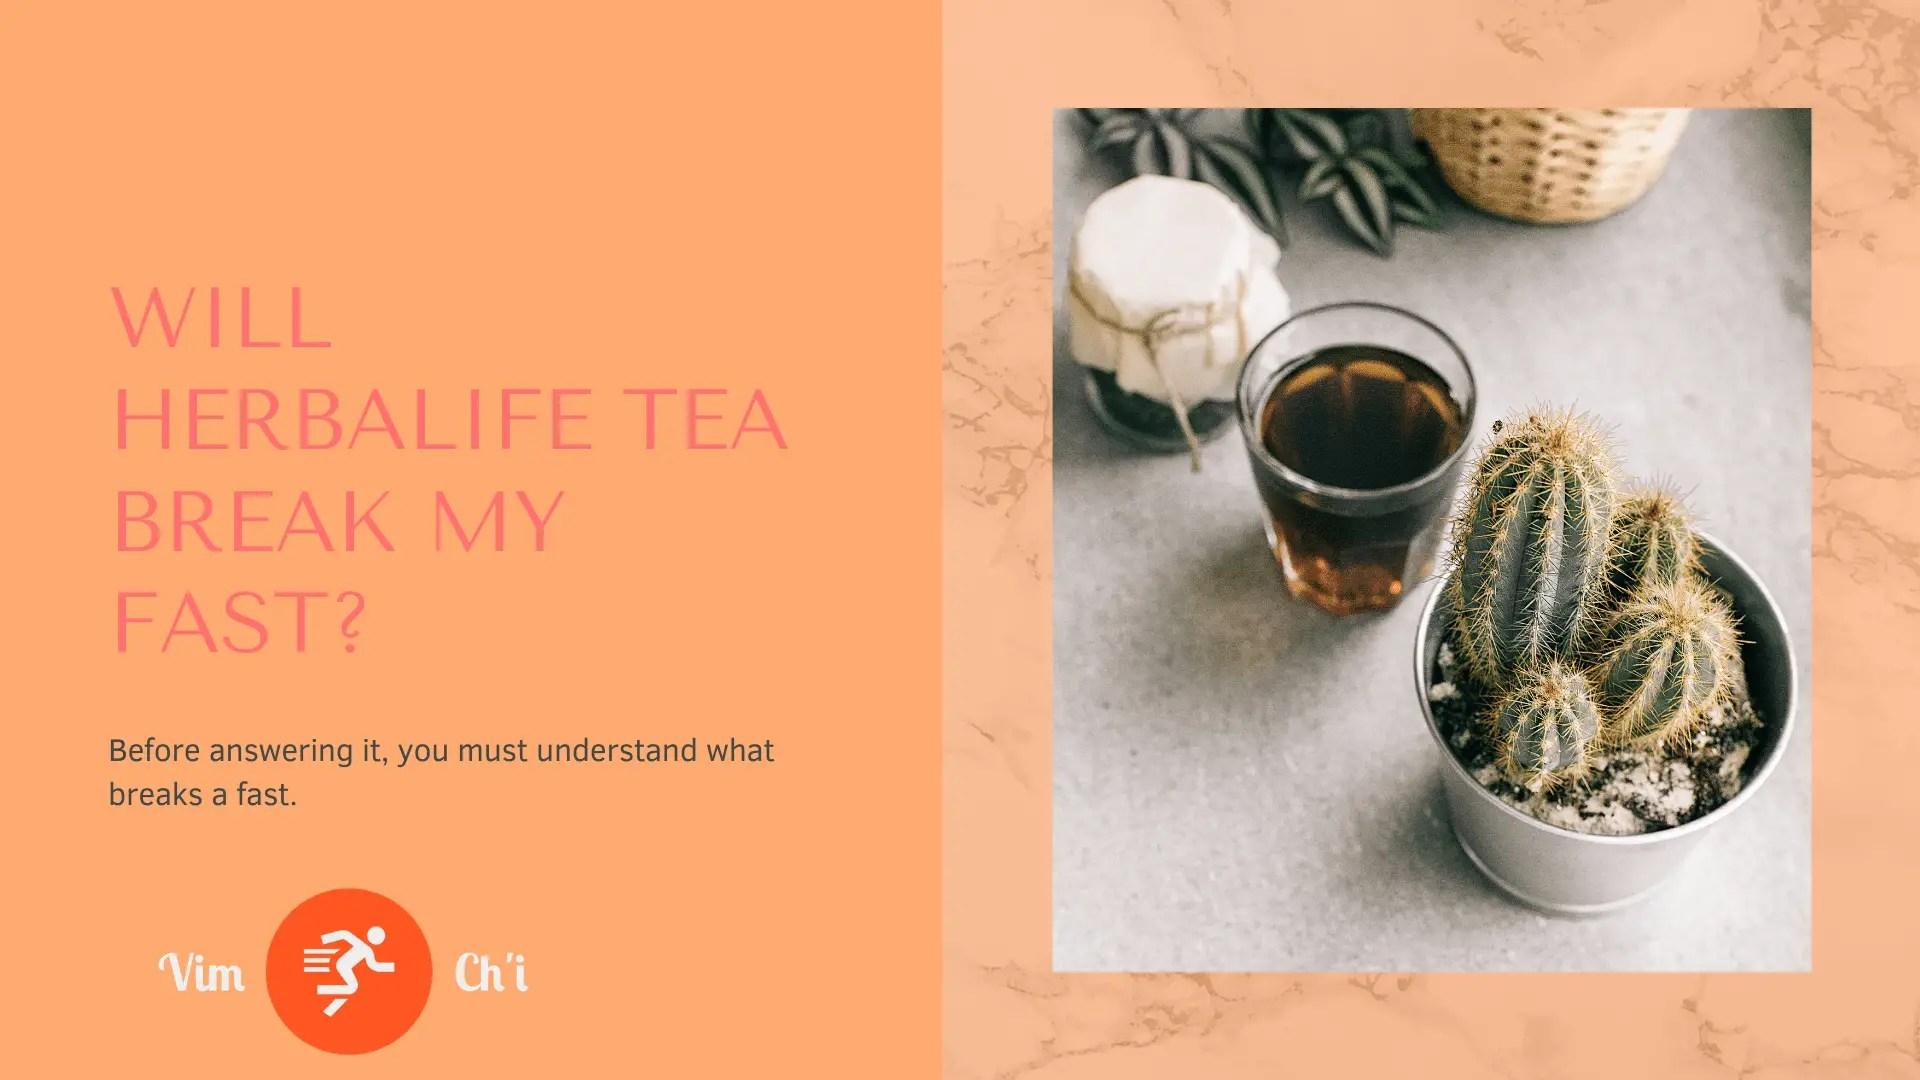 will herbalife tea break my fast